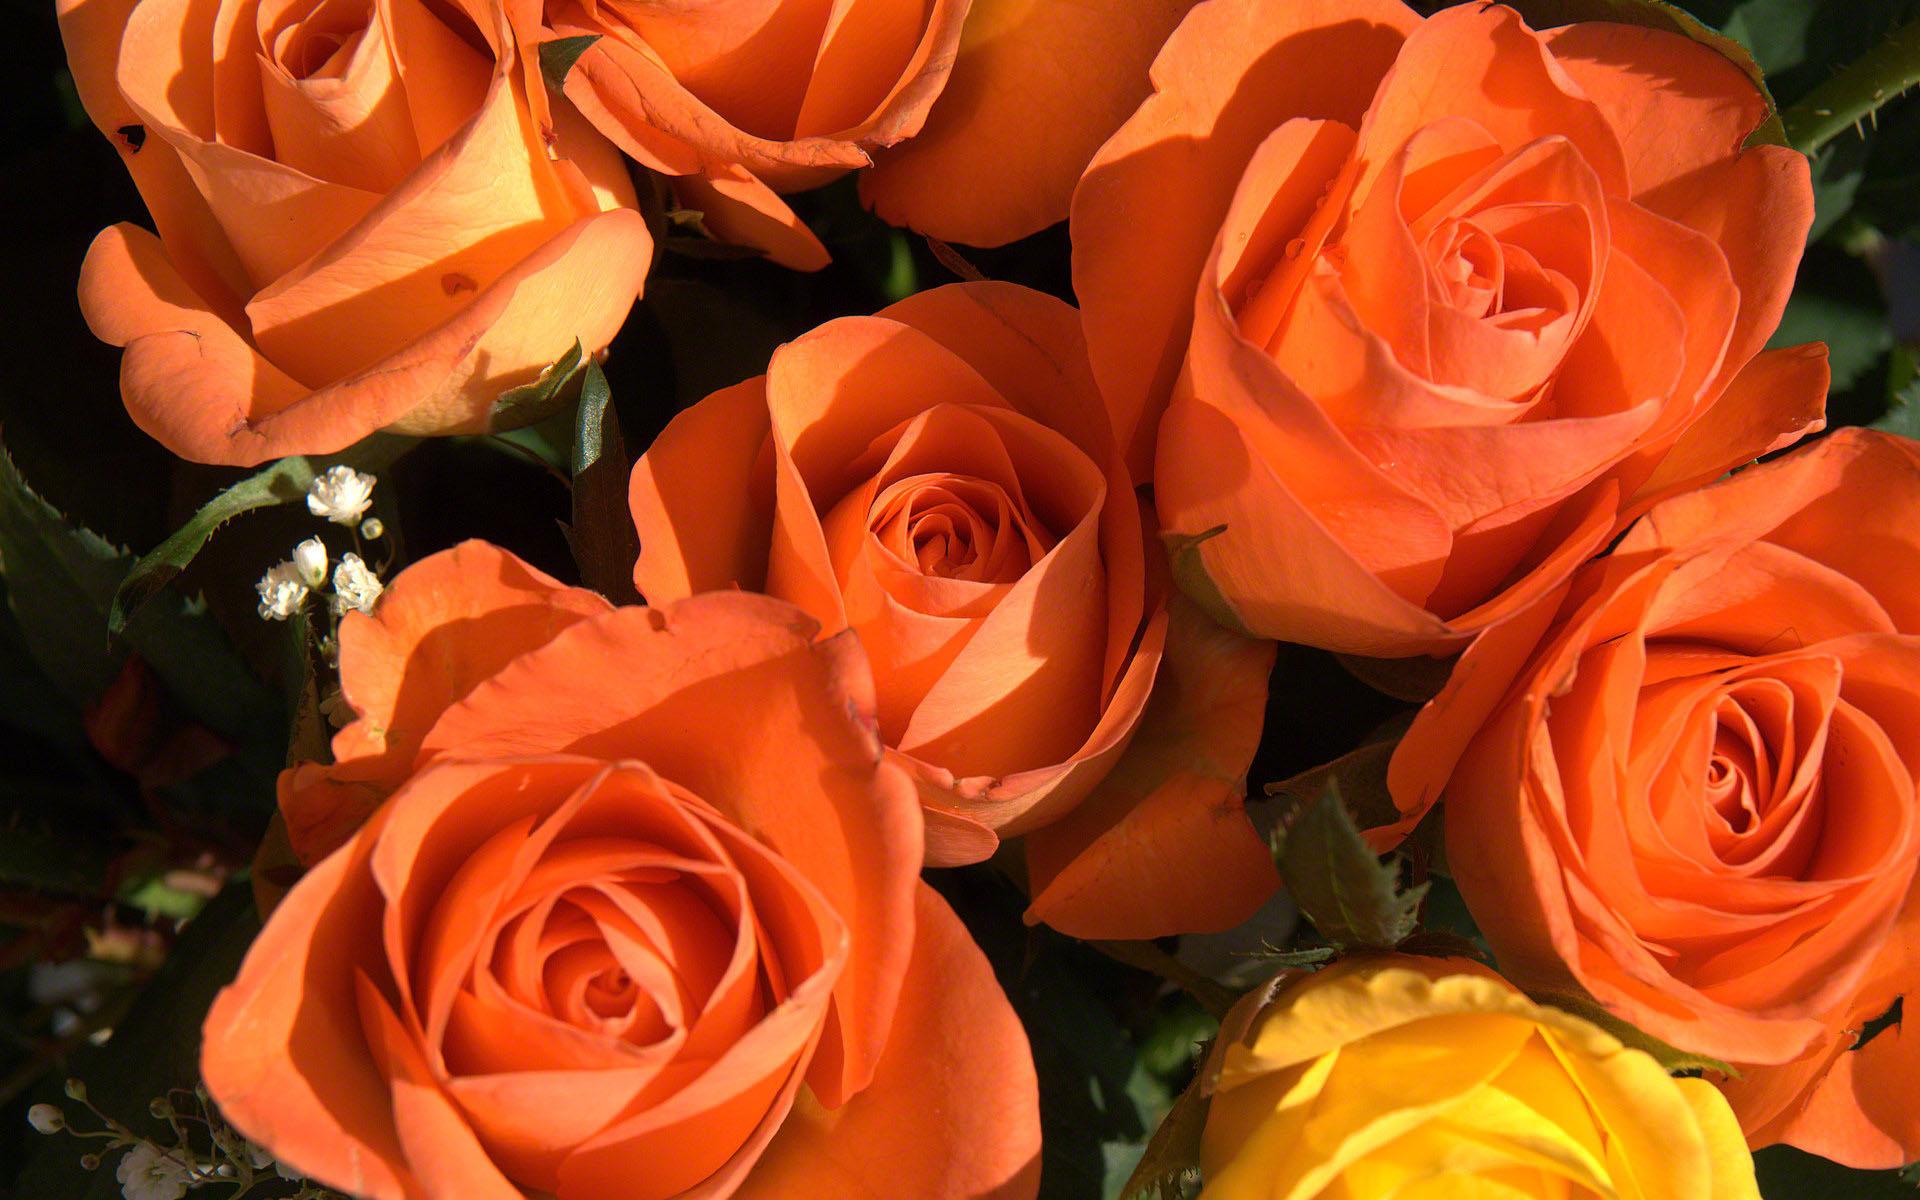 http://www.fabiovisentin.com/photography/photo/12/roses-photo-wallpaper-02640.jpg